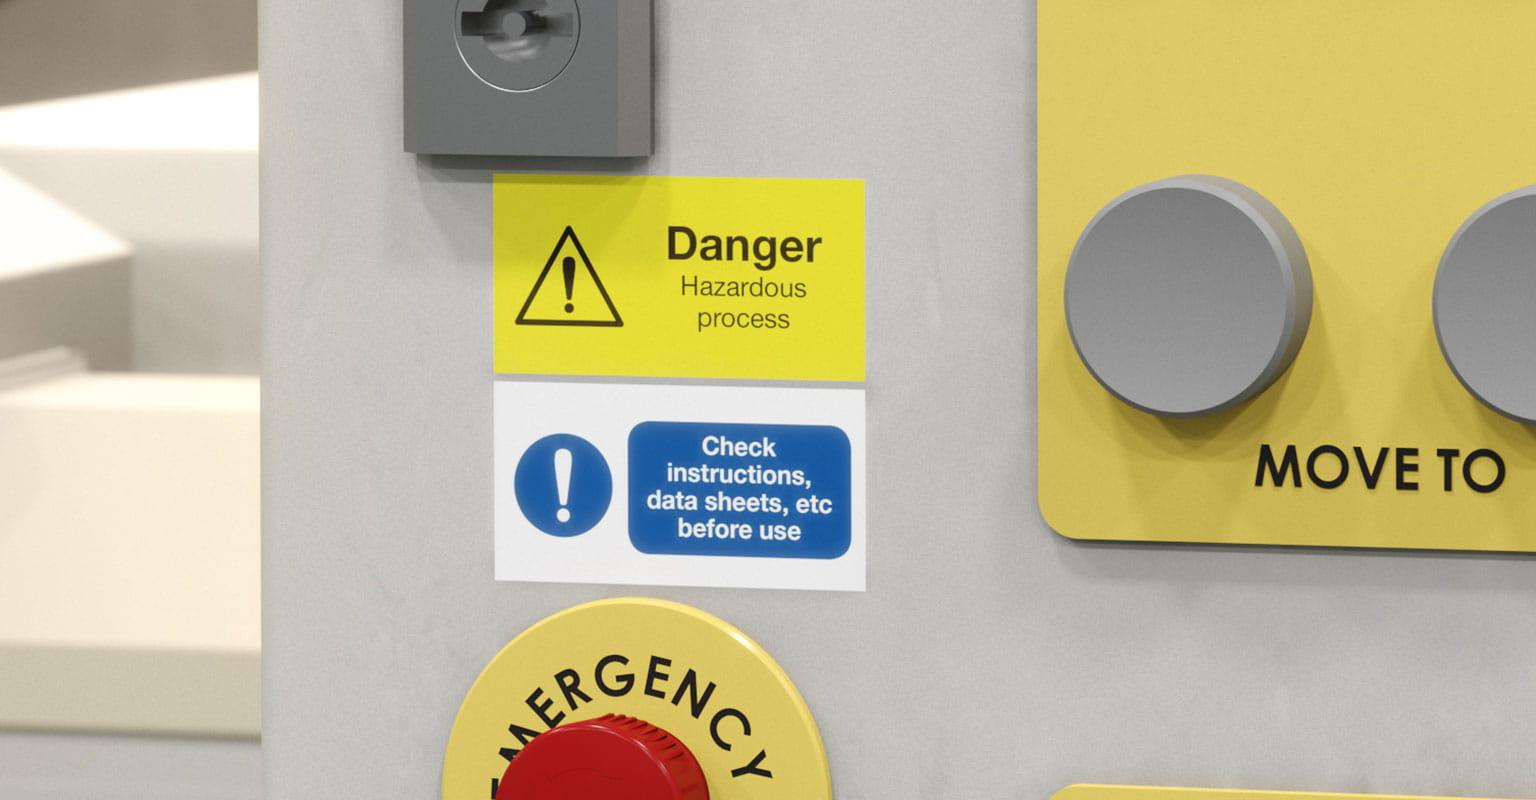 Etiquetas para alertar a perigos